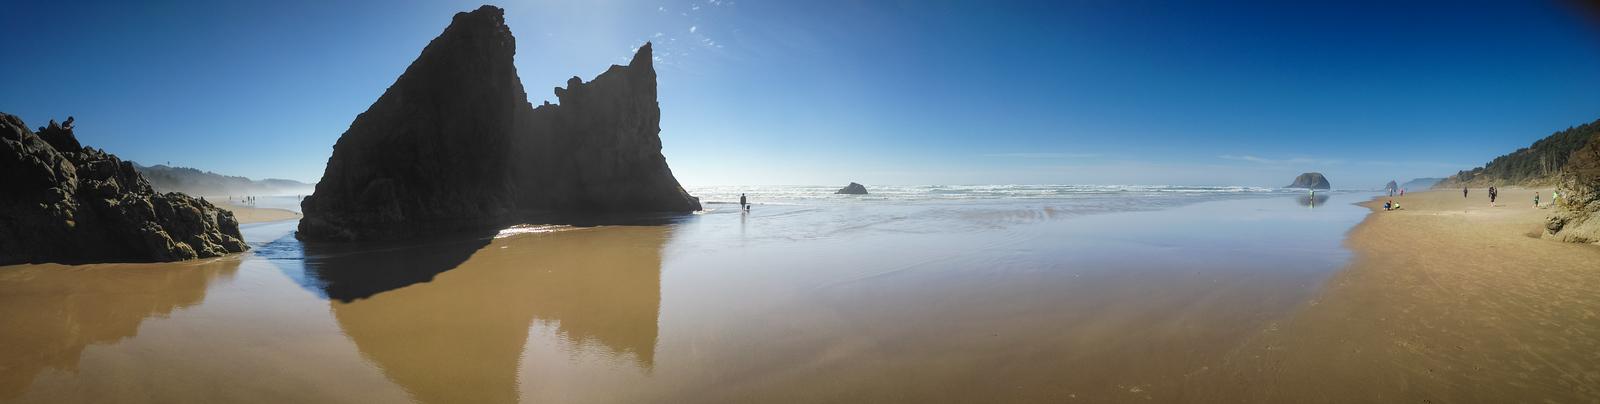 Spring Break 2015 Beach Trip